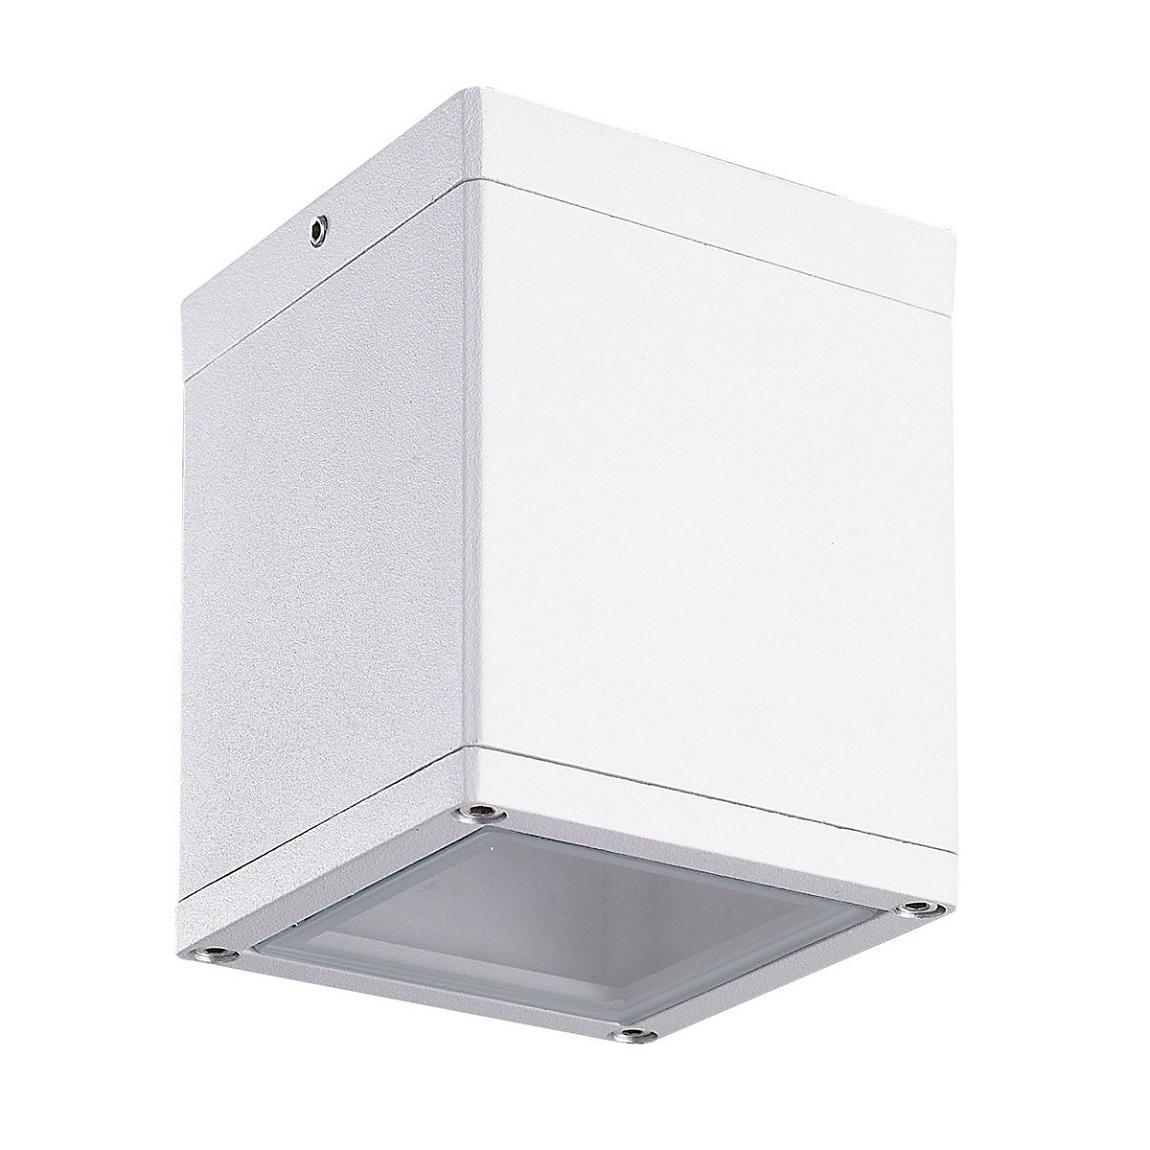 JUPITER JC064-B - İç Mekân & Dış Mekân Sıva Üstü LED Spot Kasası